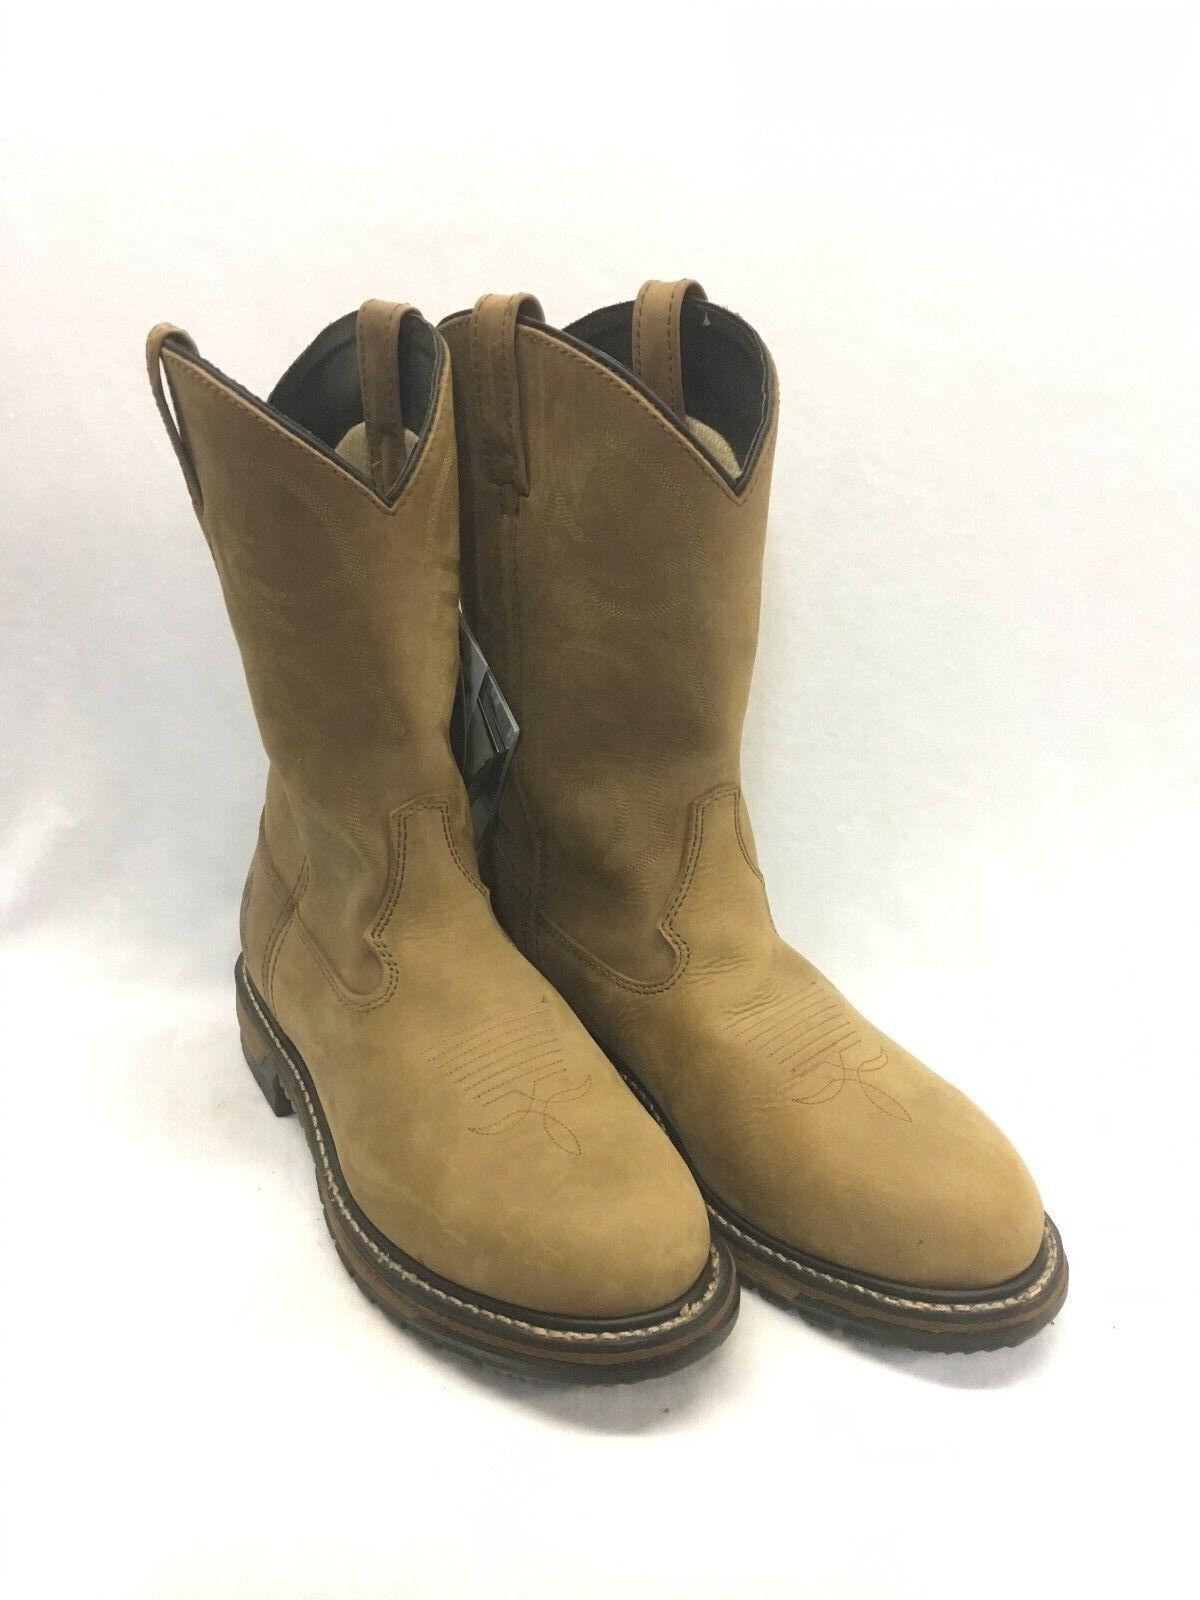 Men's Rocky Boots-Original Branson Tan Workboot, Style 2733